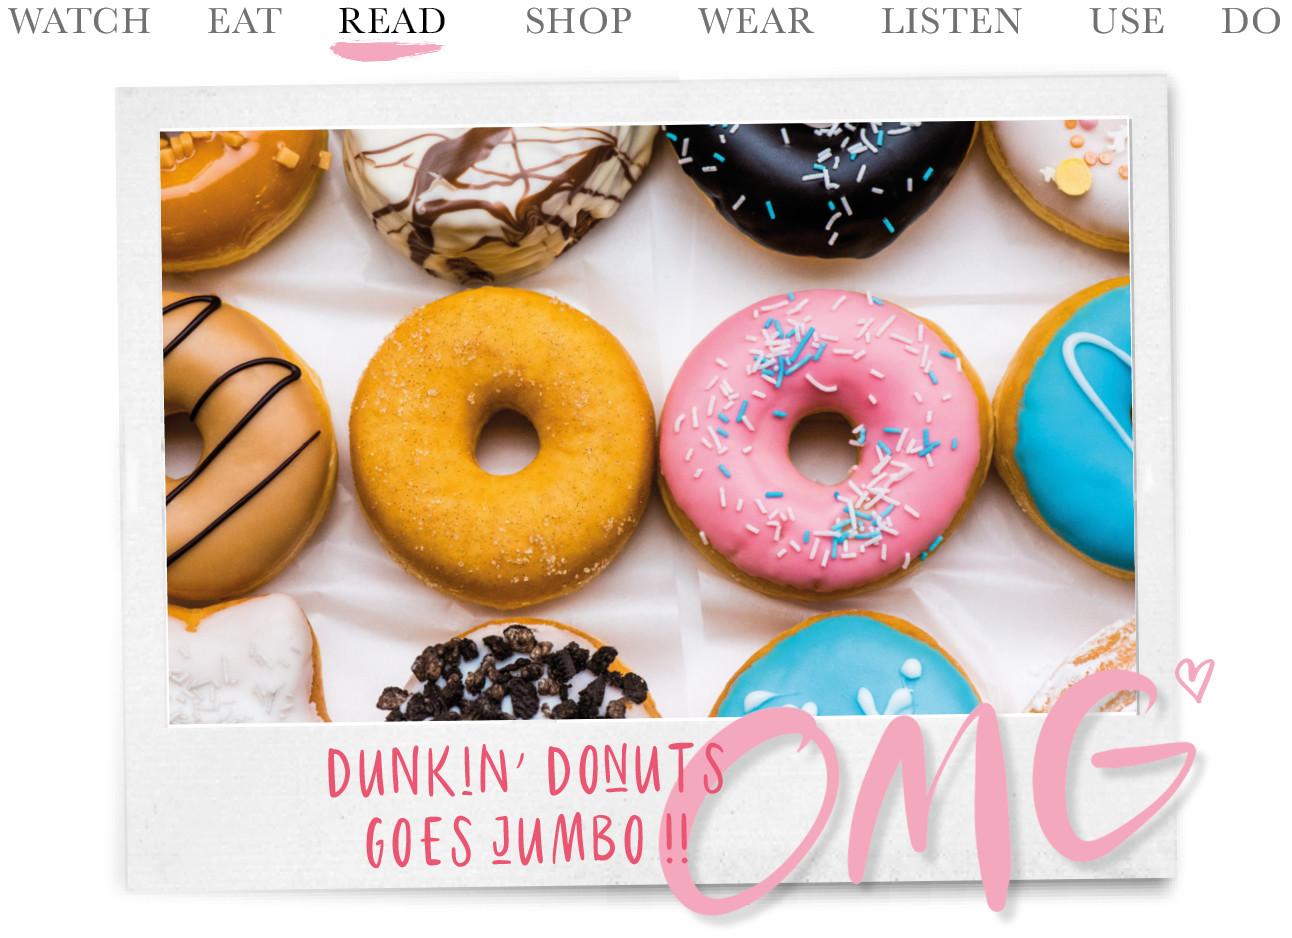 Dunkin donuts smaken